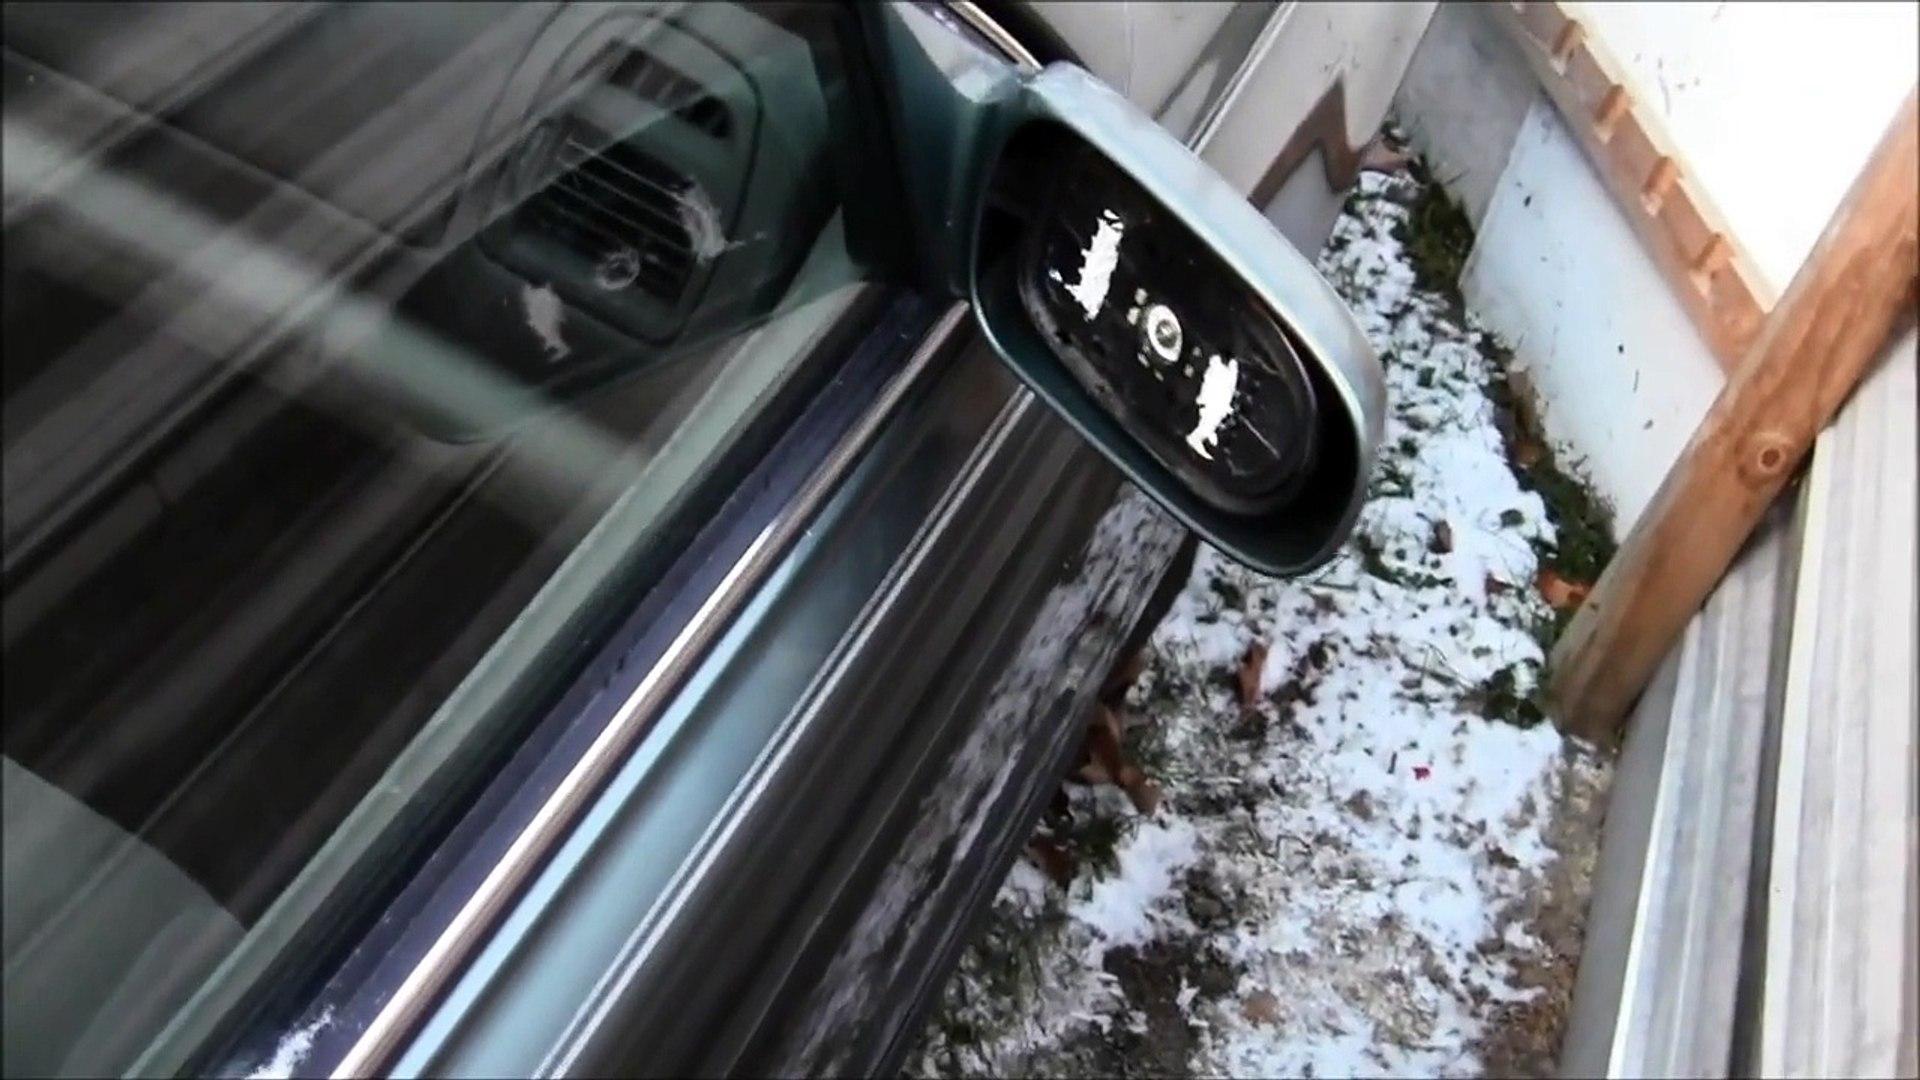 New Door Mirror Glass Replacement Passenger Side For Kia Magentis 01-06